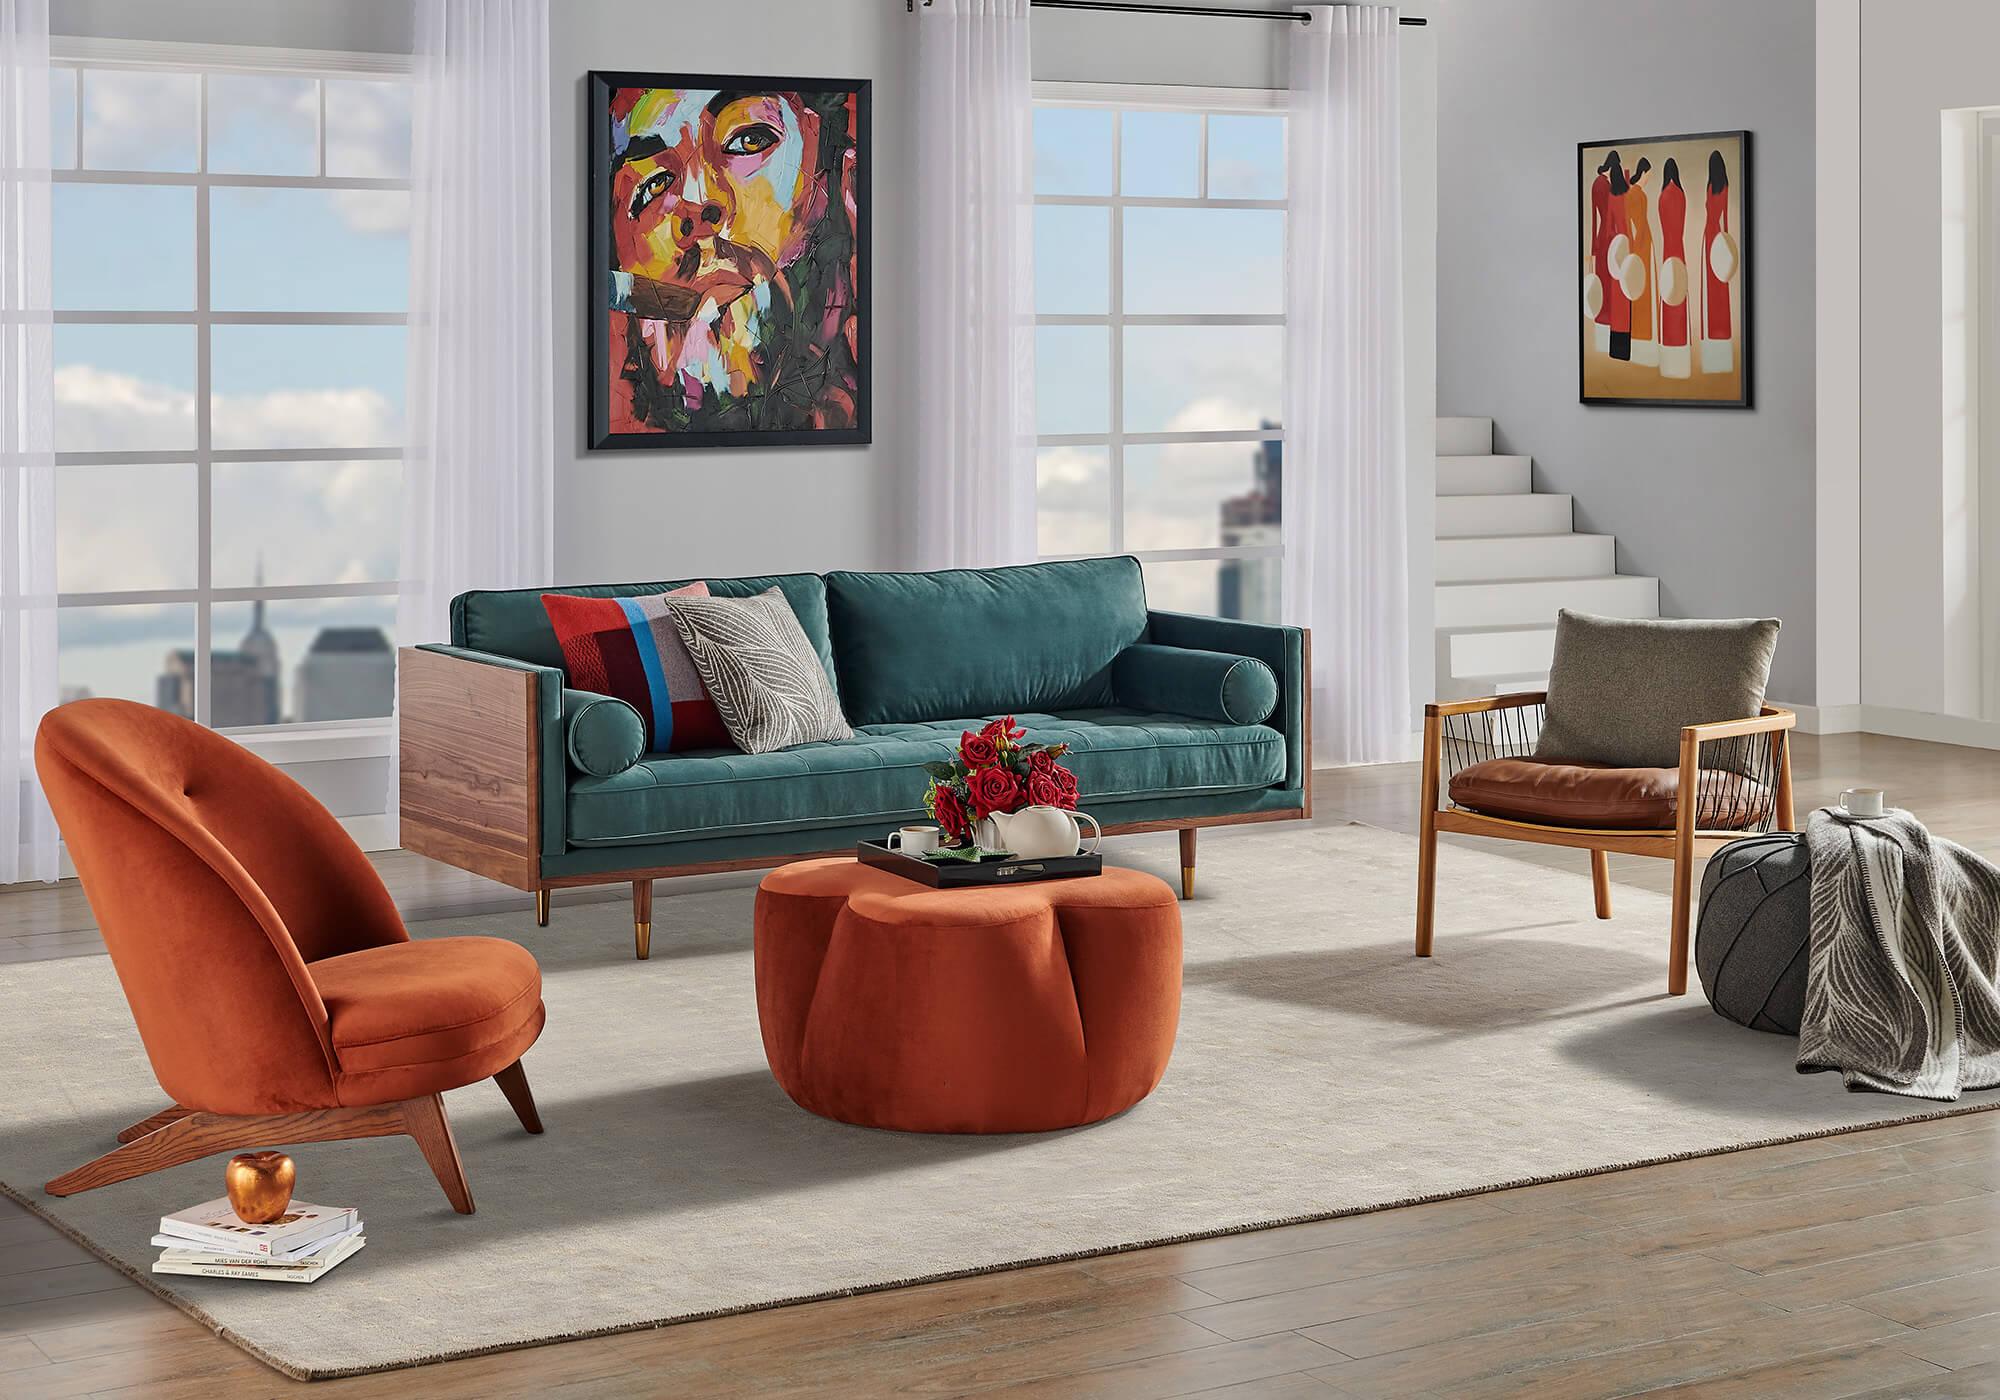 Woodskan 3 Crosshatch Buttercup Fabric Sectional Sleeper Sofa